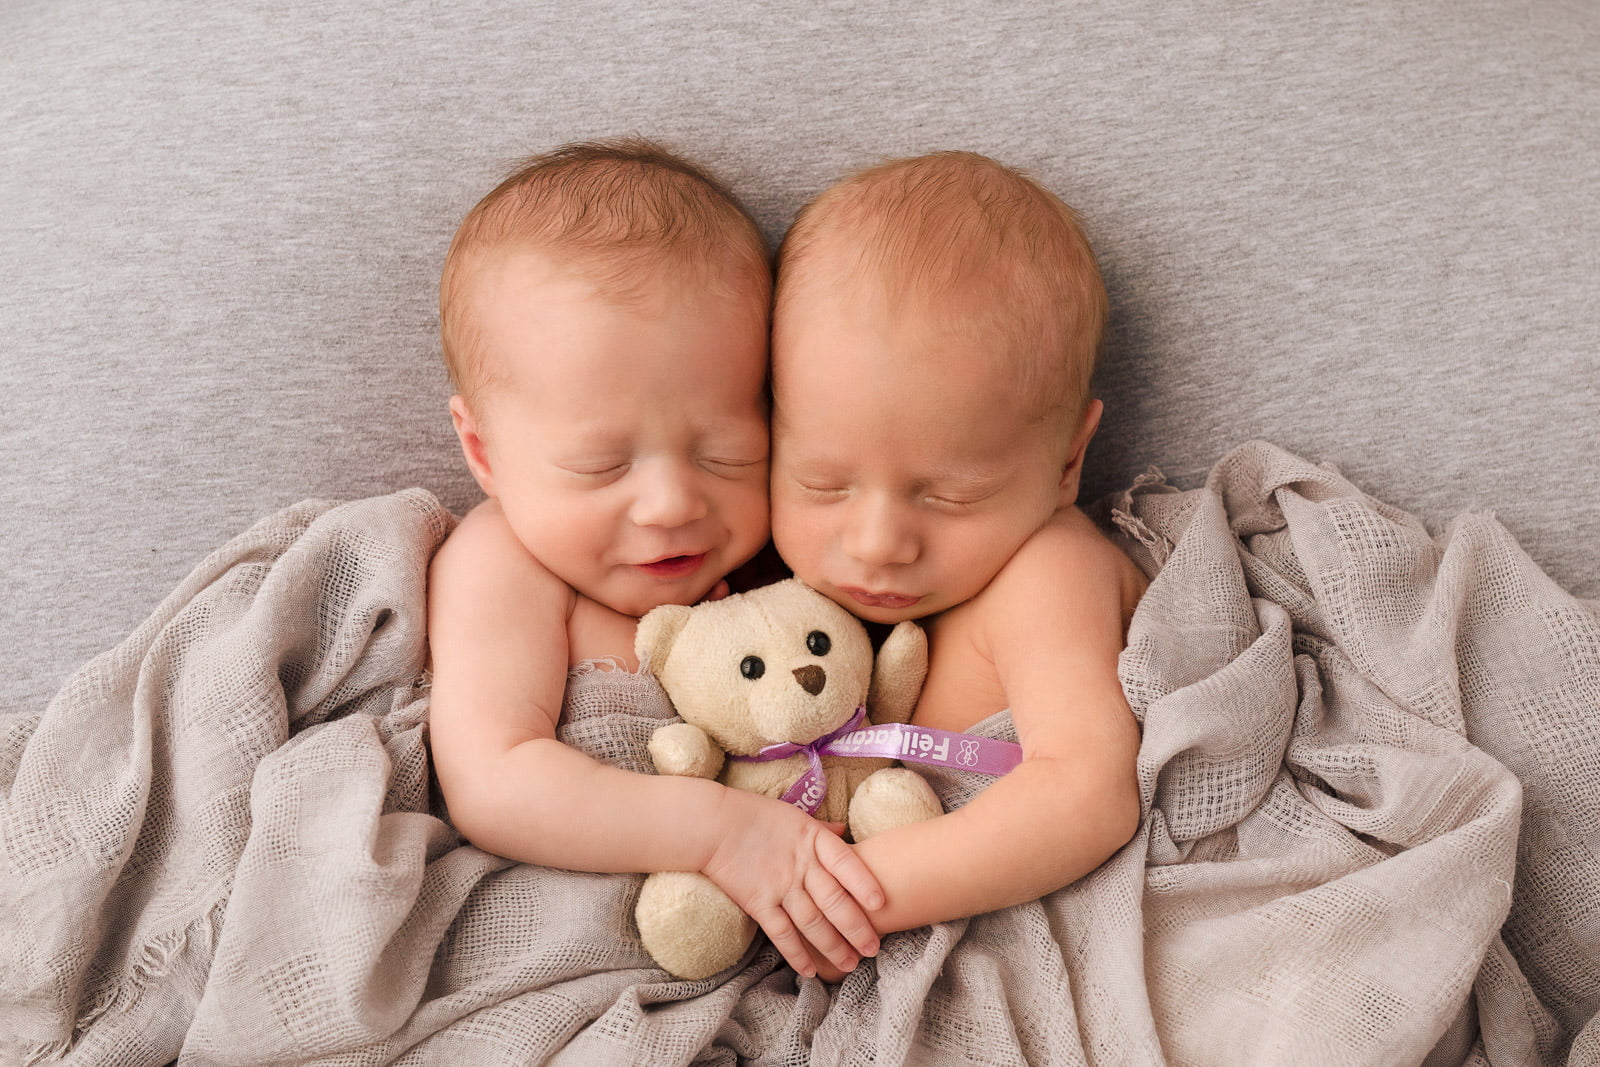 Adorable Newborn Rainbow Twins 4